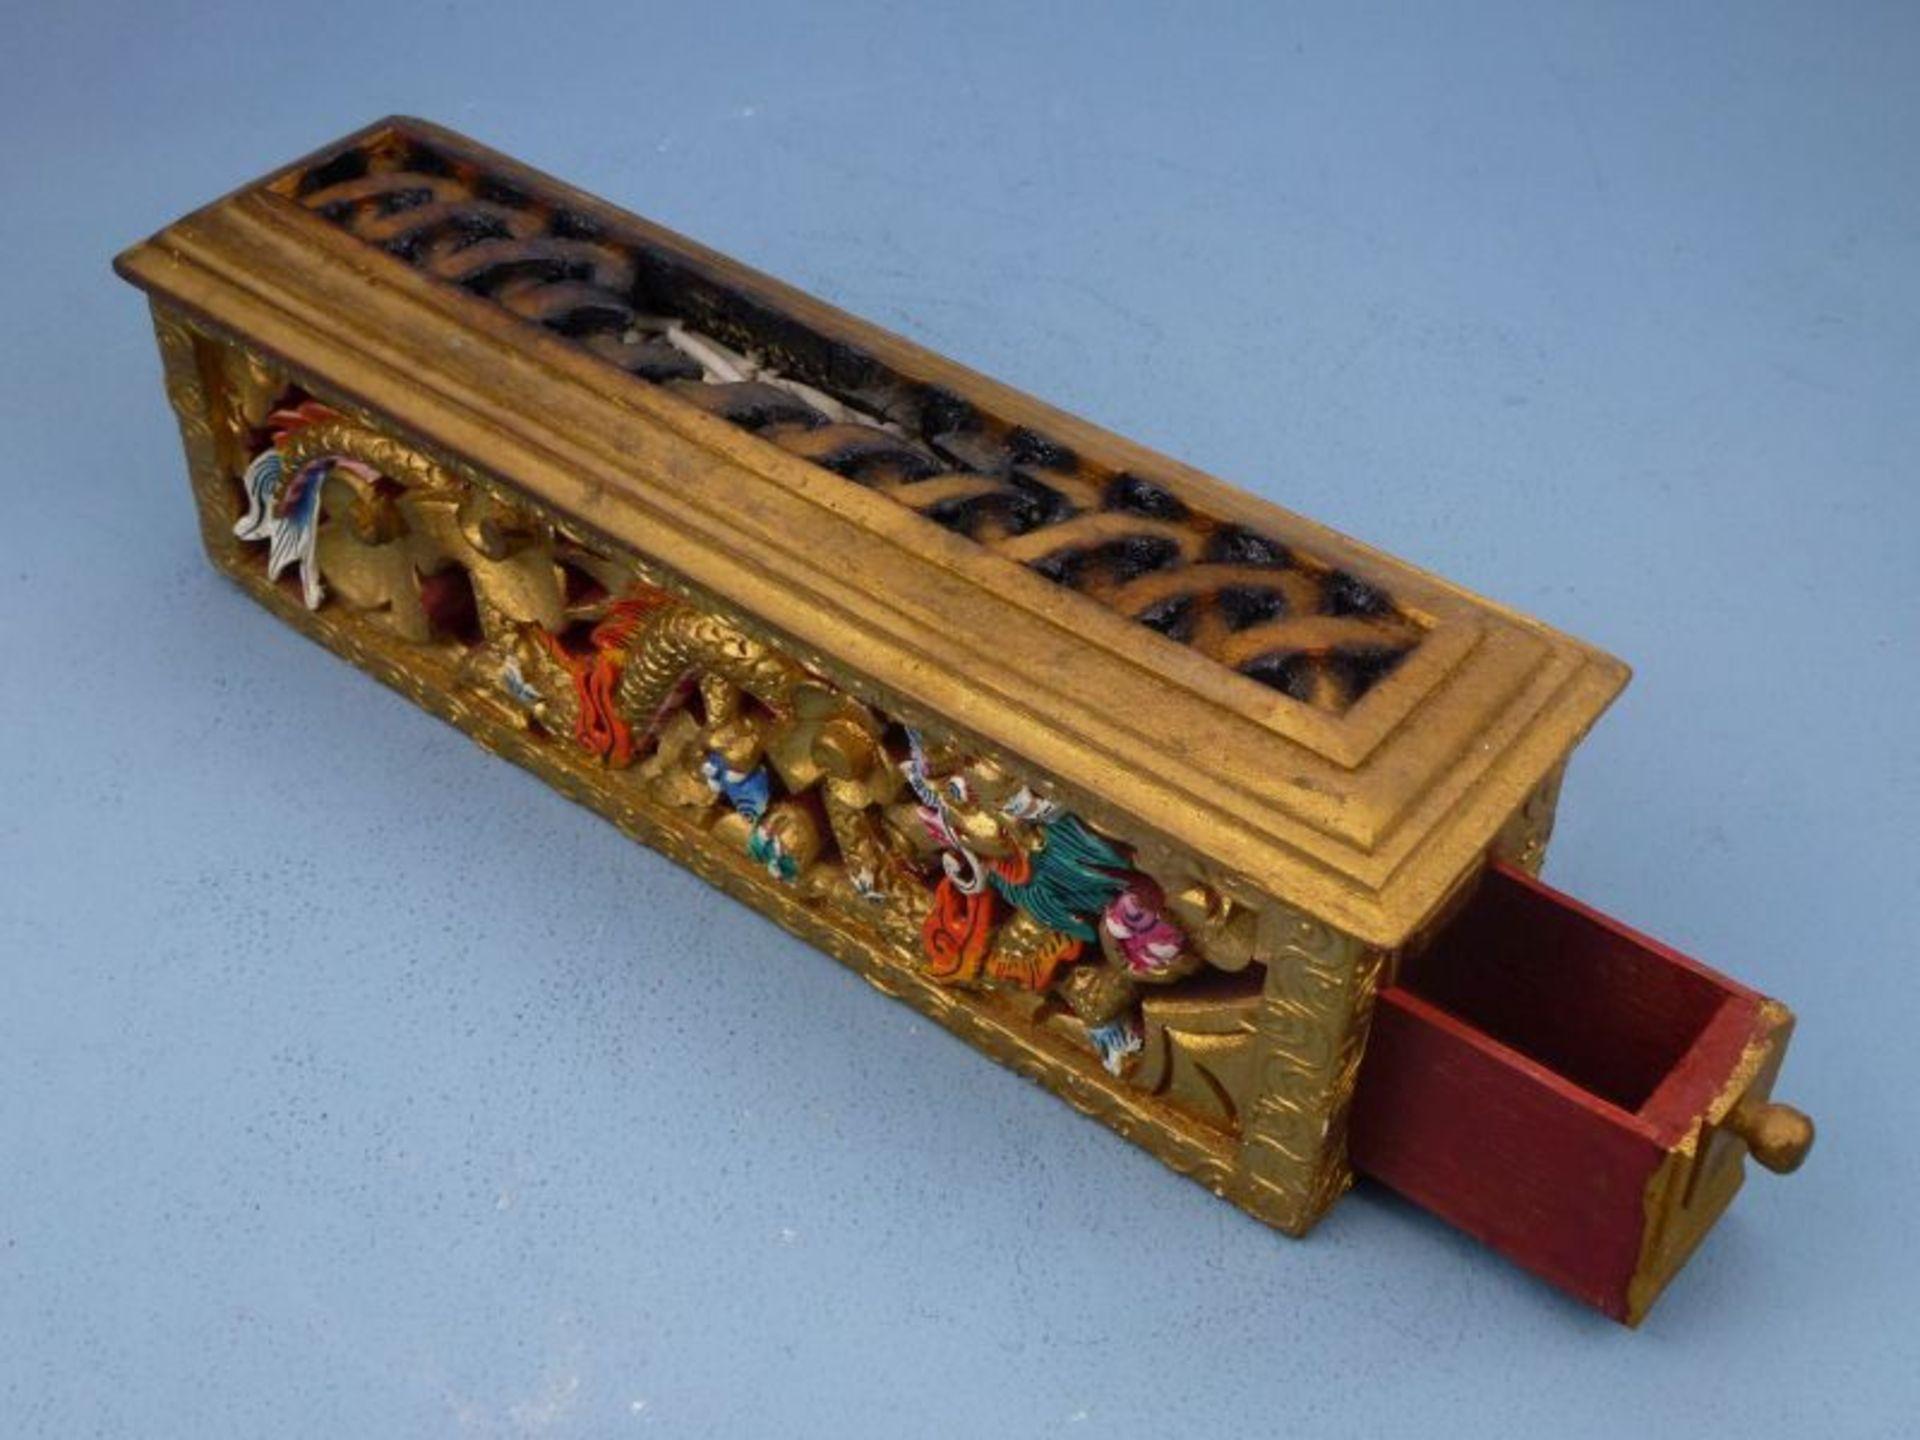 Los 16 - Räuchergefäß, Asien, 20.Jh.Holz geschnitzt, polychrom bem. u. vergoldet, langrechteckiger Kasten